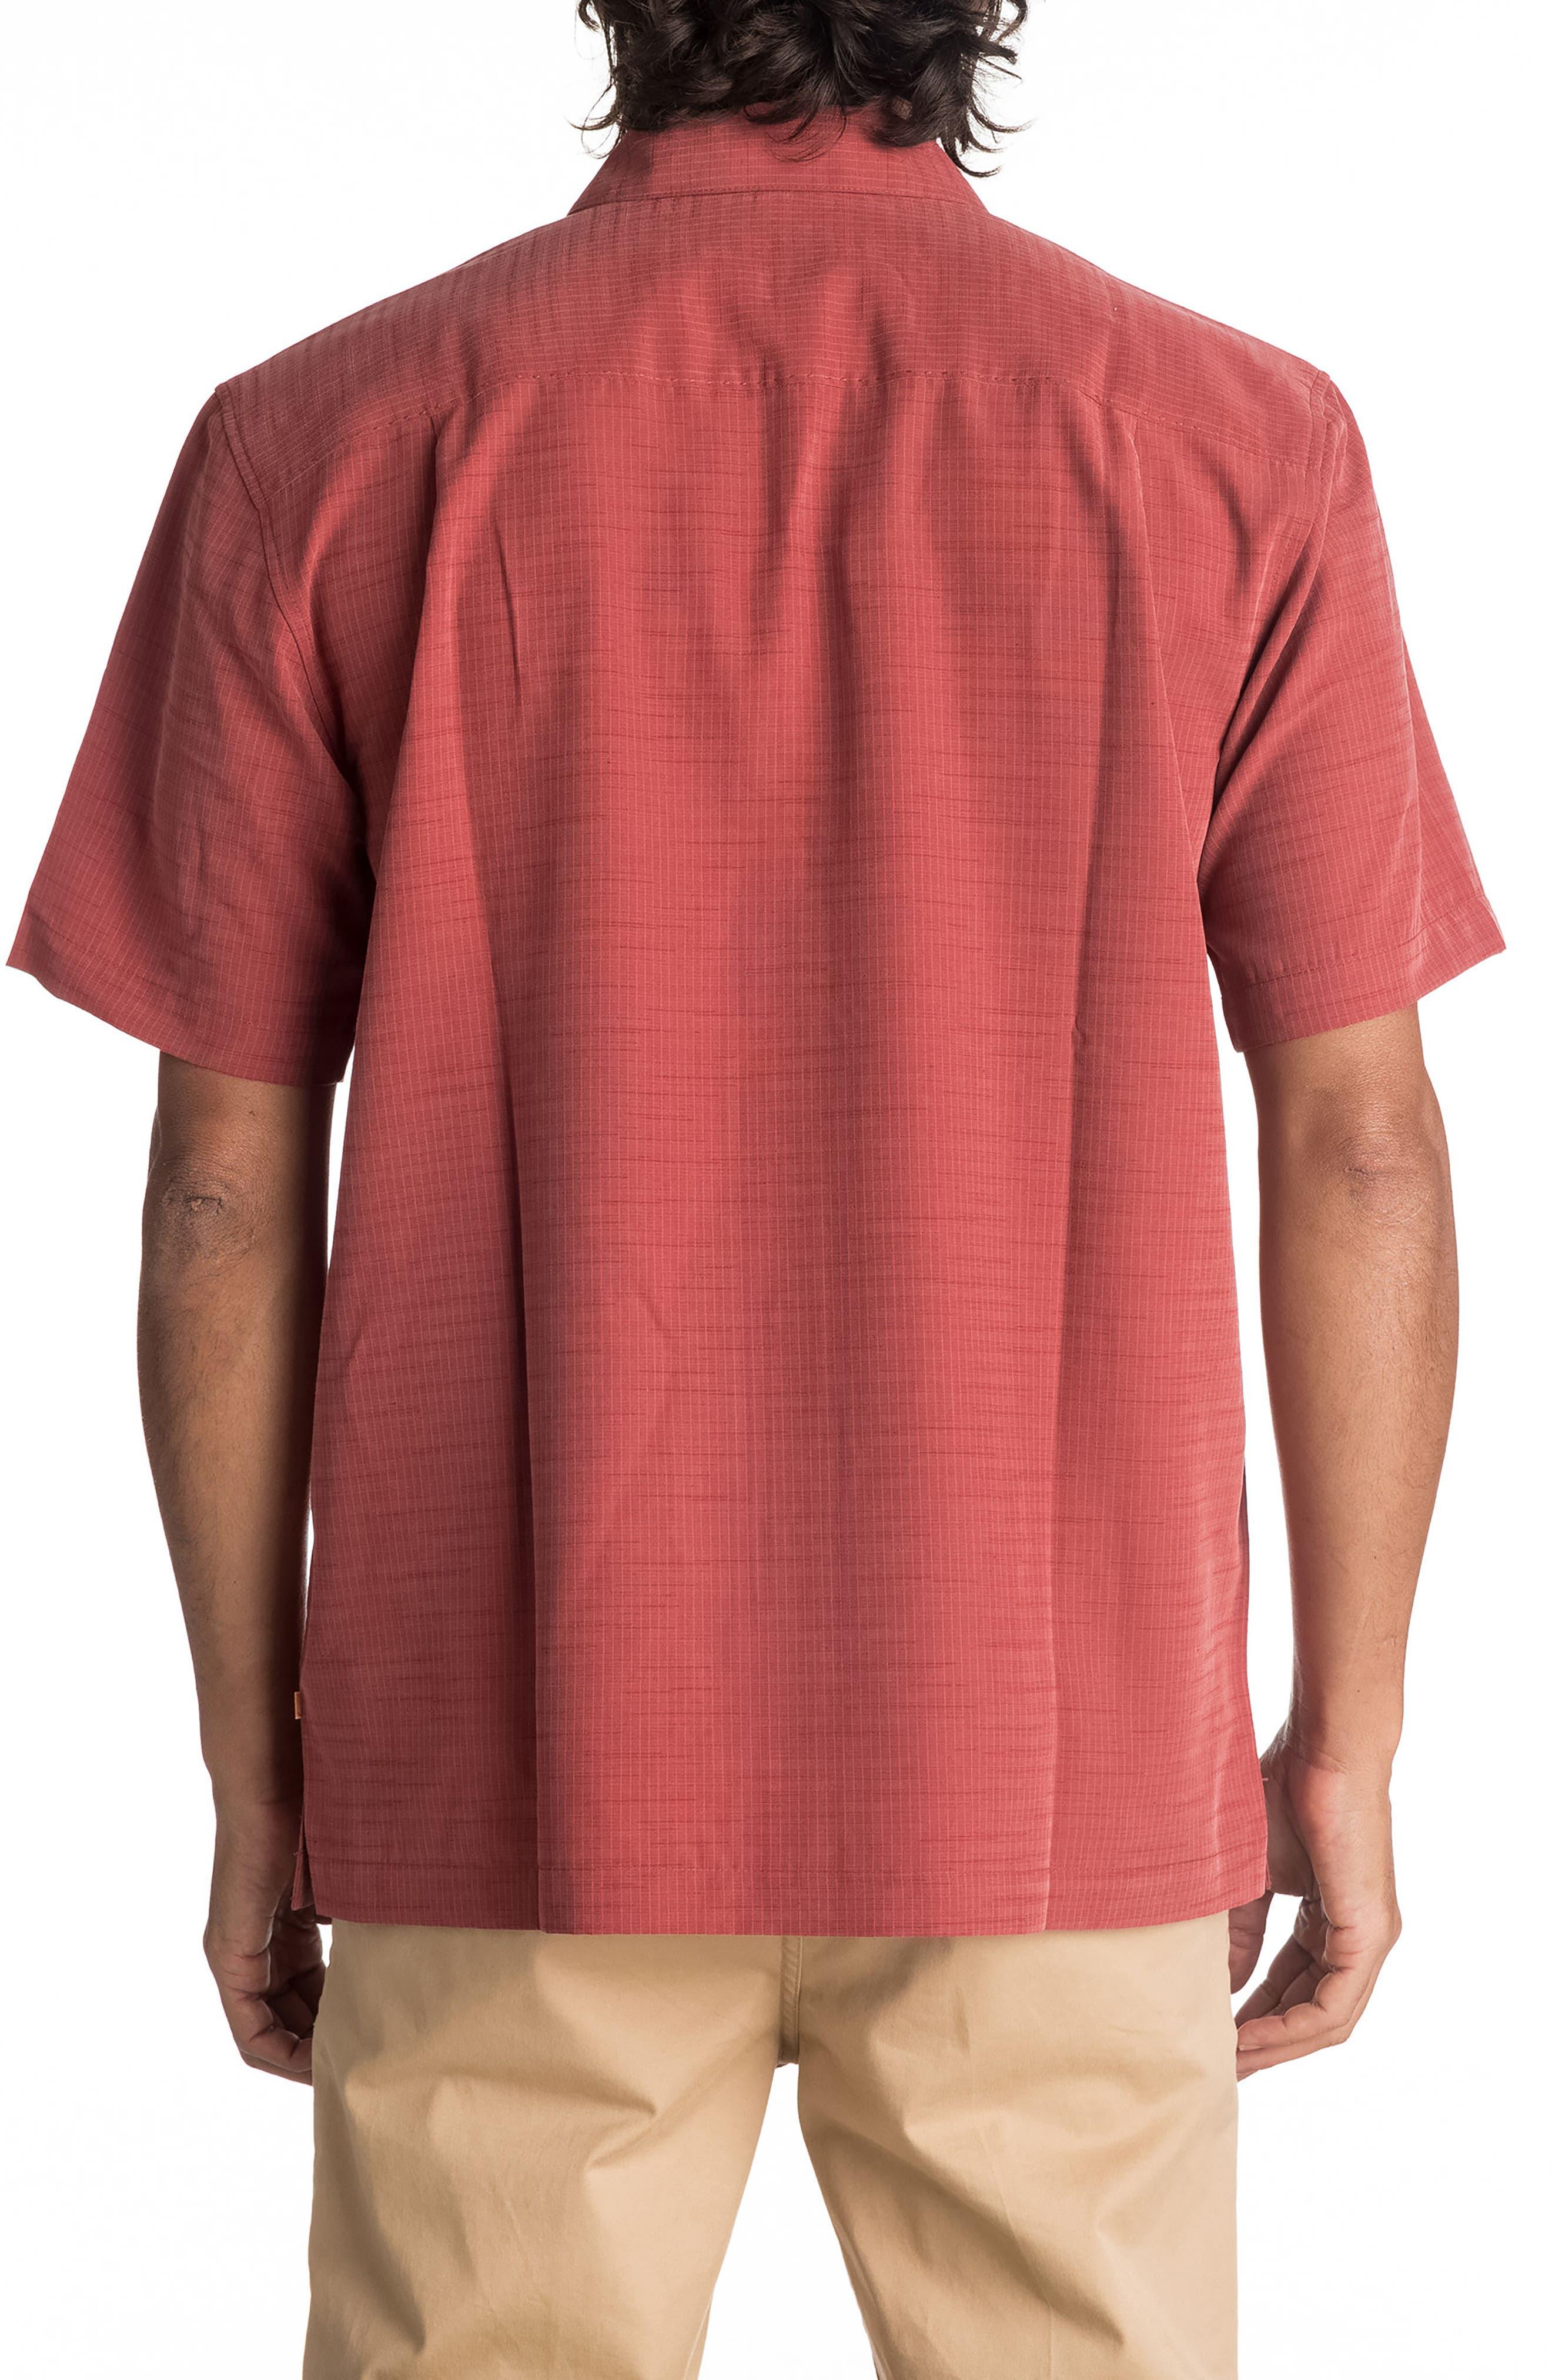 Alternate Image 2  - Quiksilver Waterman Collection 'Centinela 4' Short Sleeve Sport Shirt